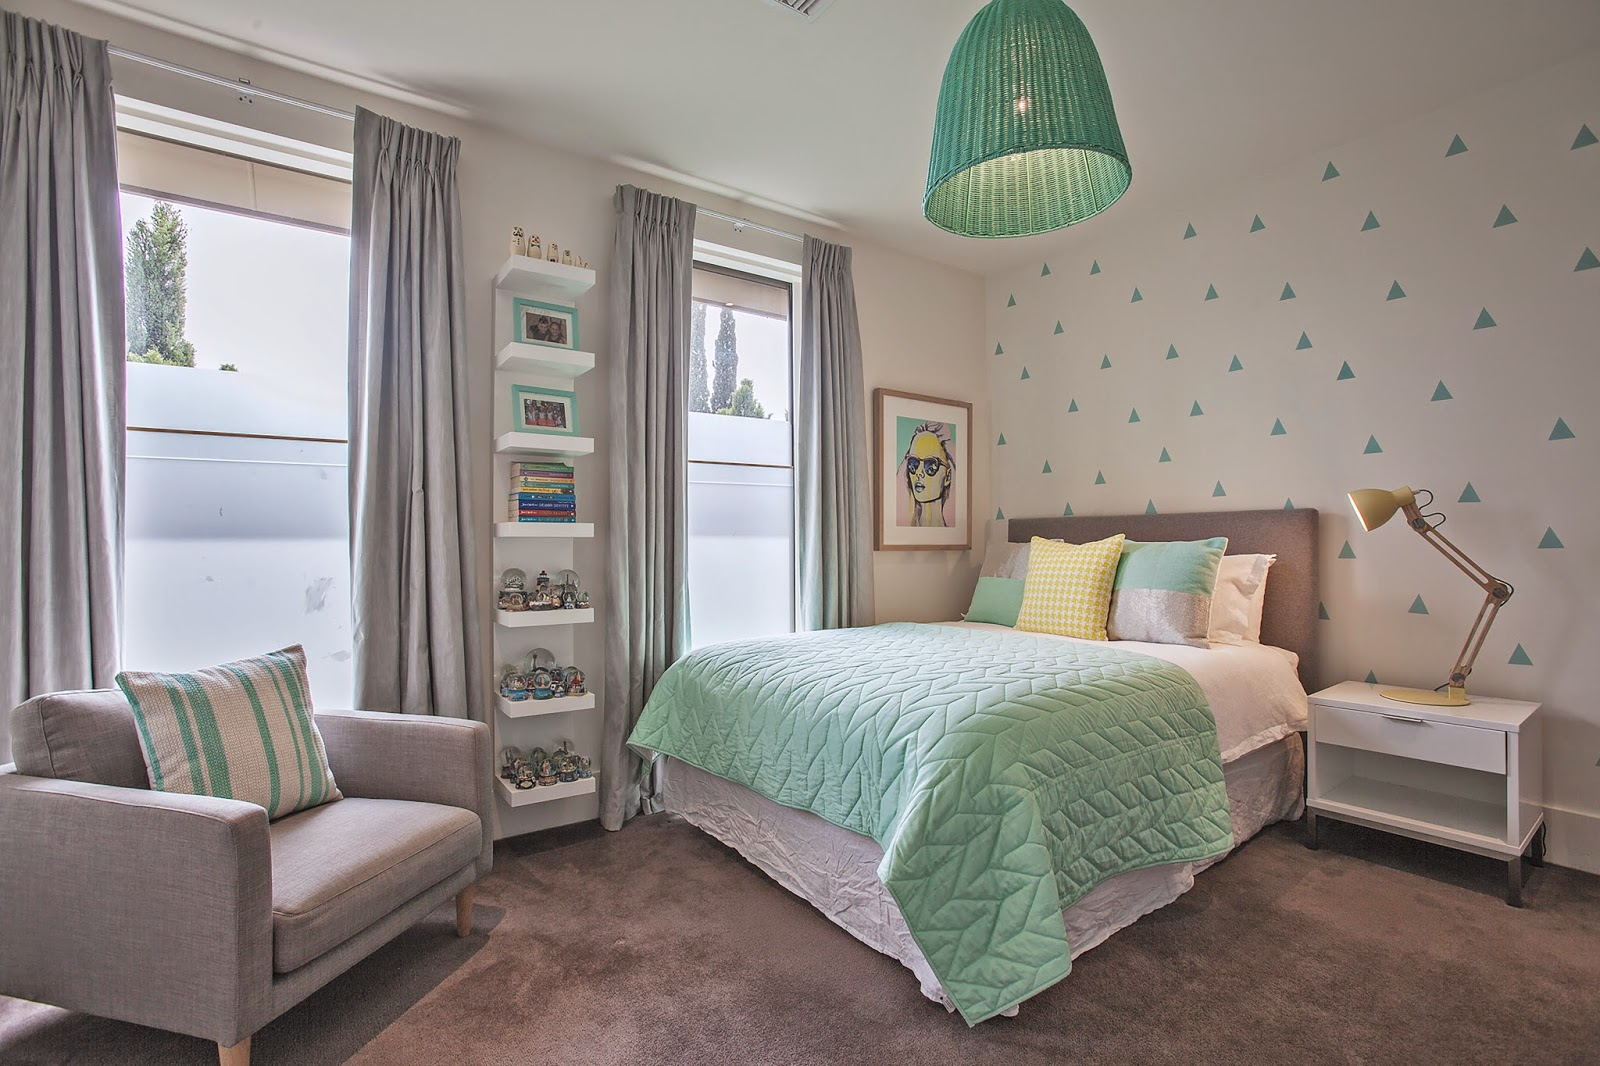 amazing gray green teen bedrooms | Little Liberty: Fresh Mint